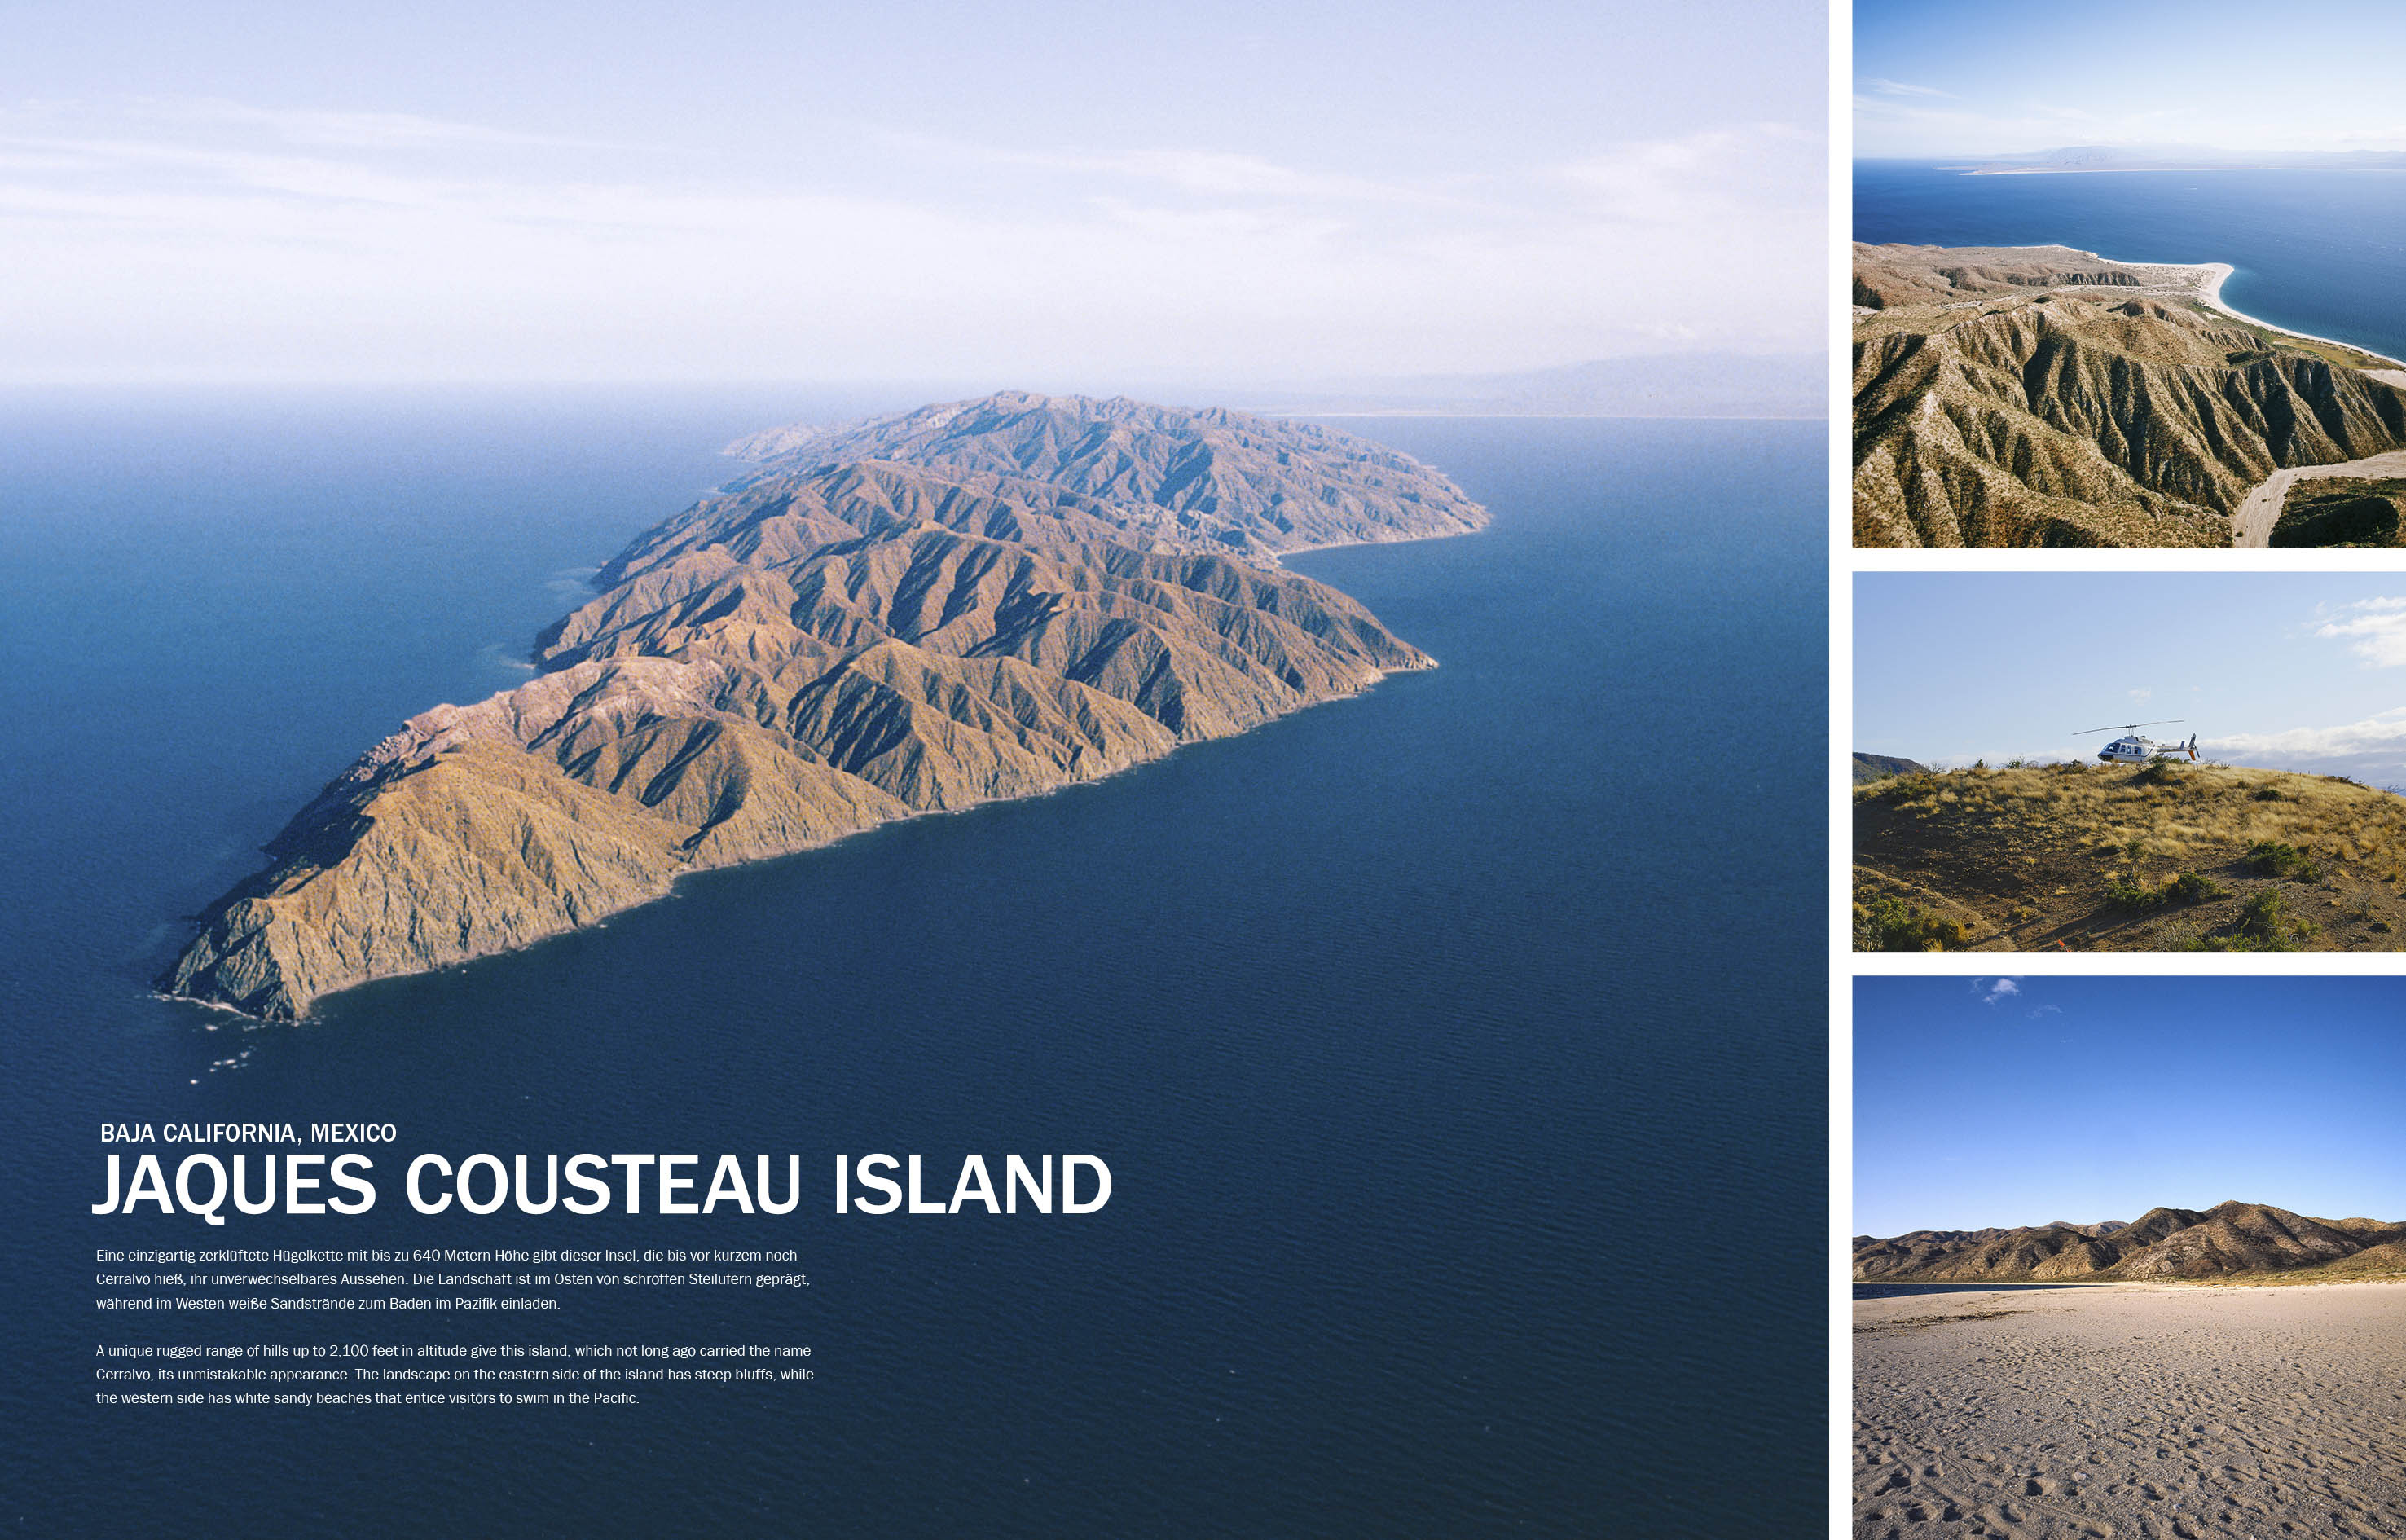 jaques cousteau island